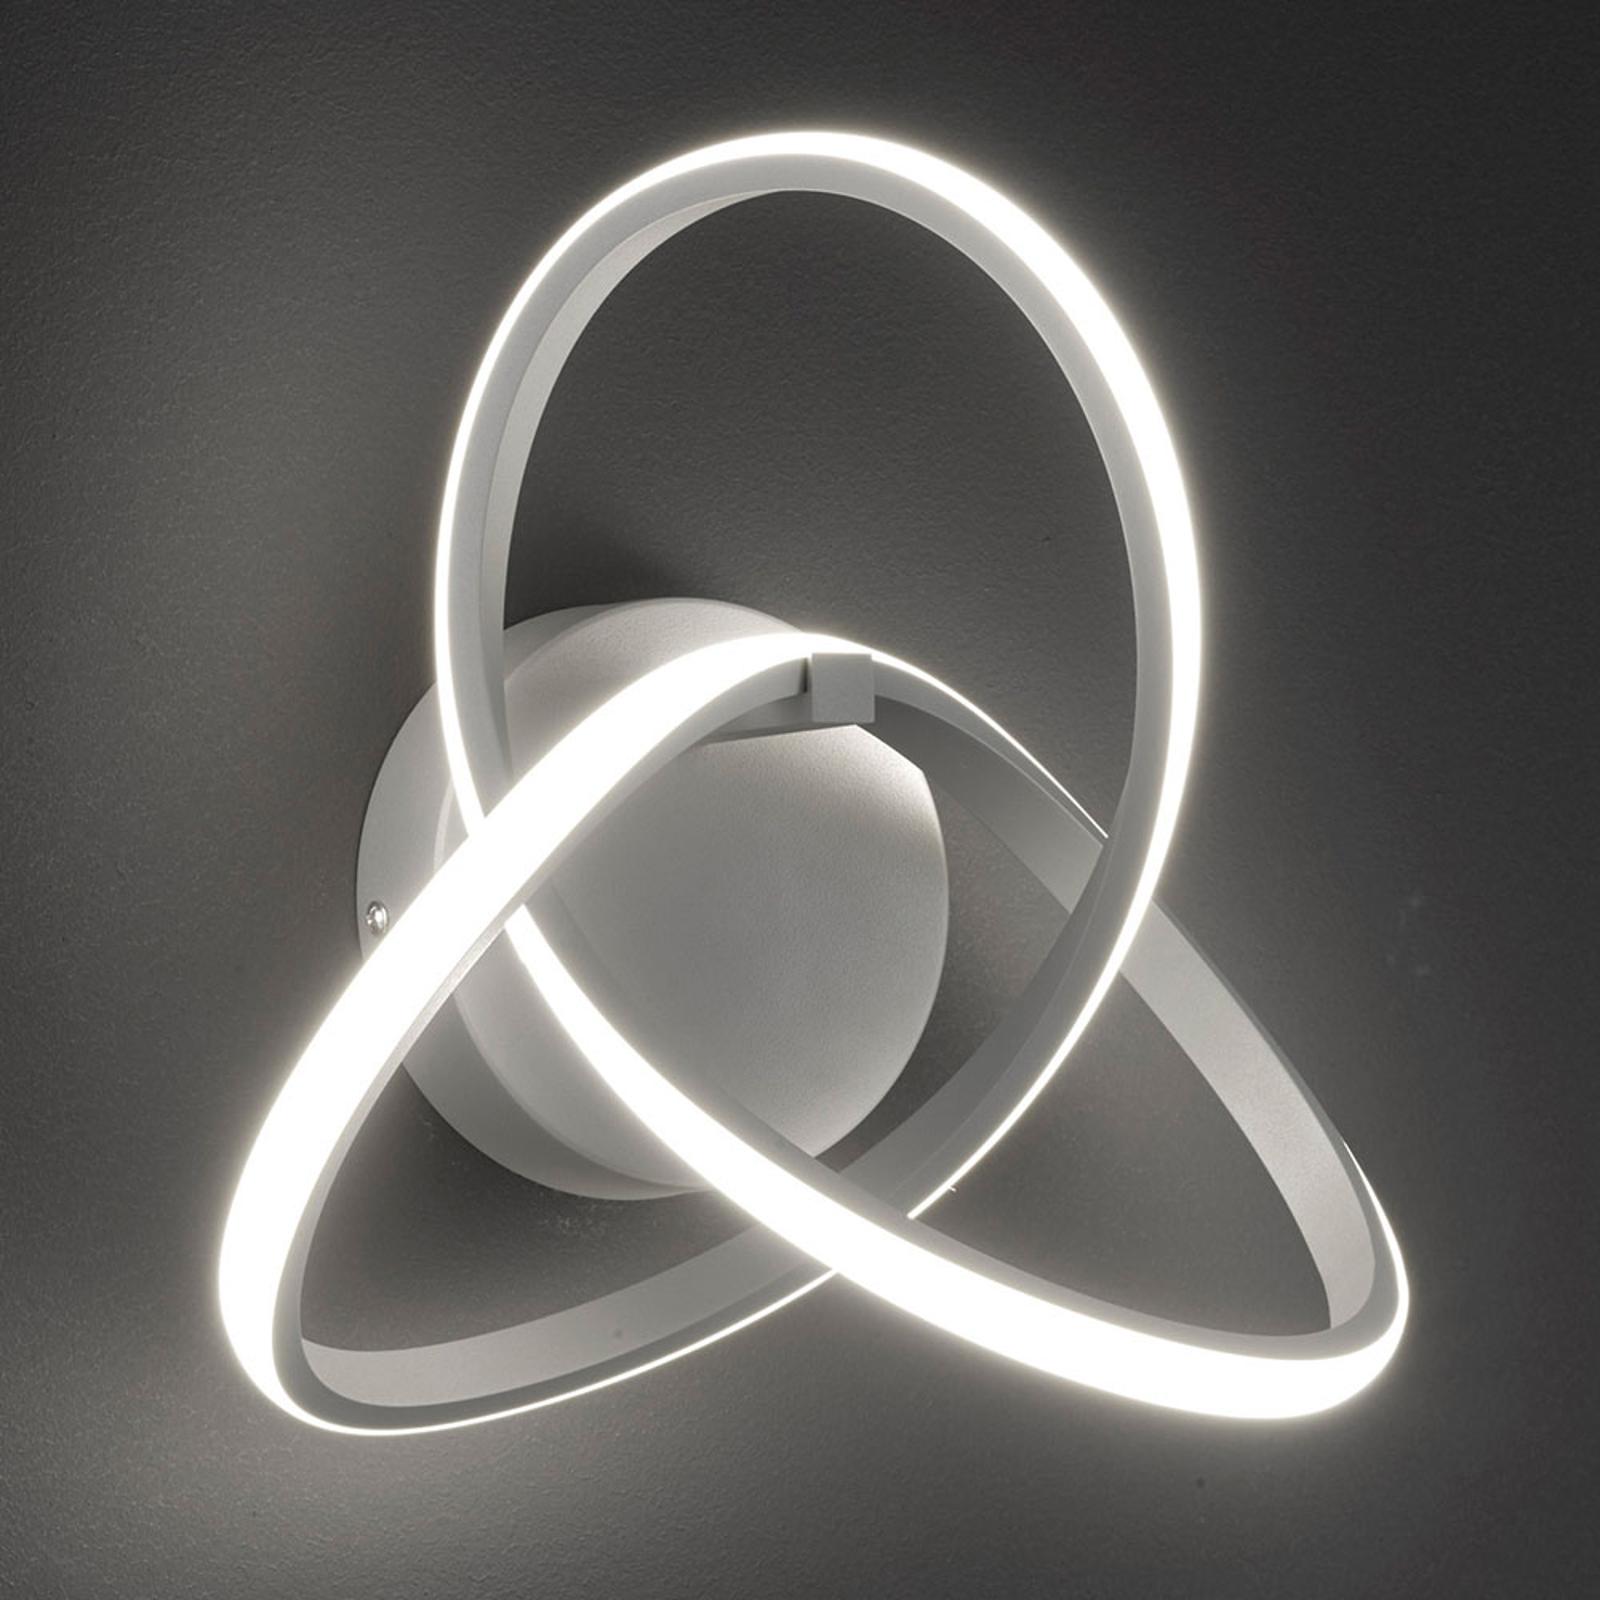 LED-vegglampe Indigo, antrasitt